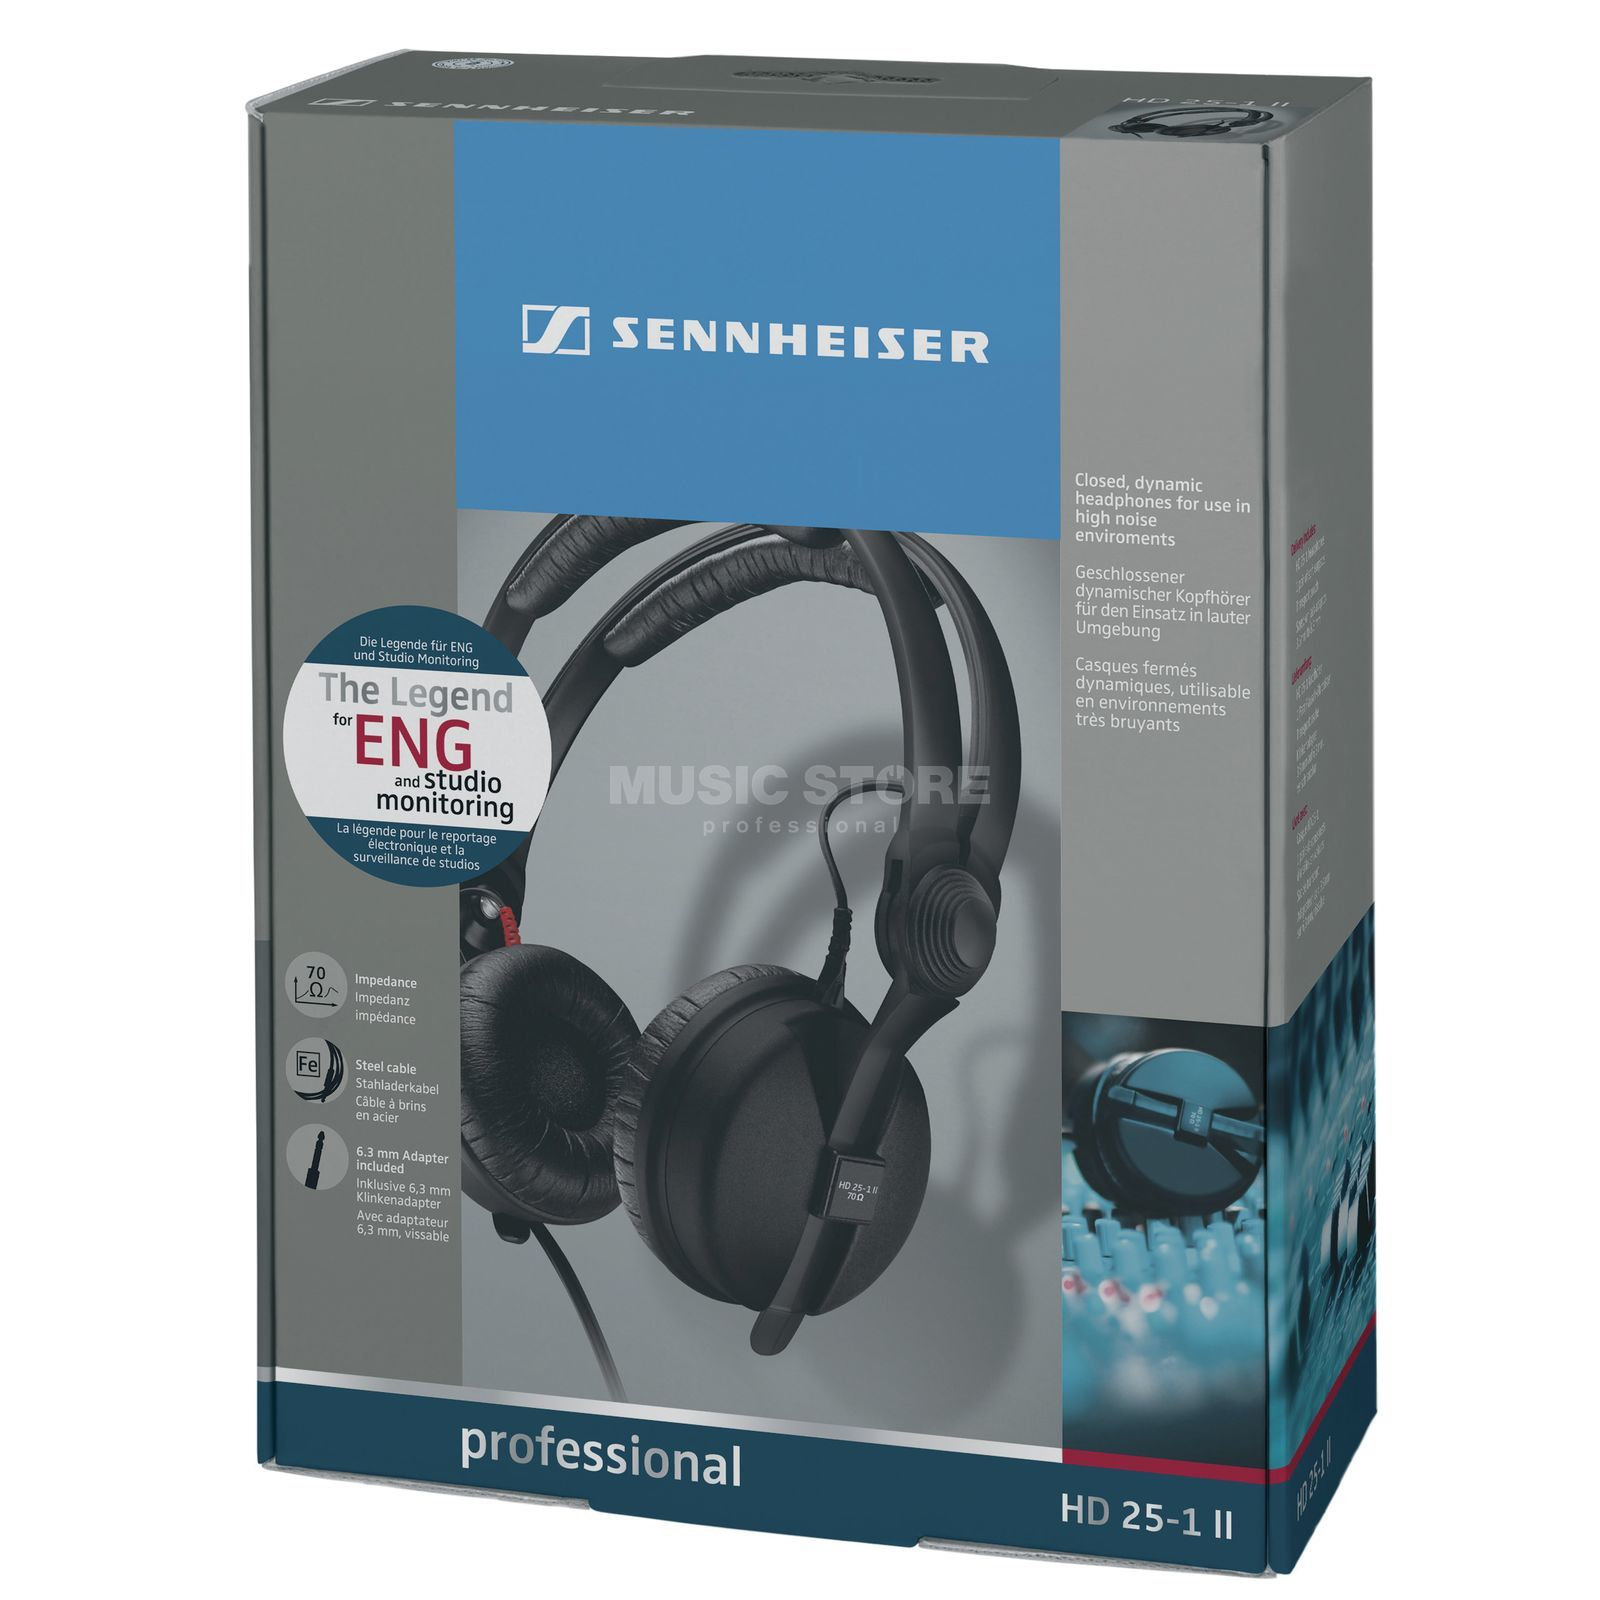 Sennheiser Hd 25 1 Ii Professional Headphones